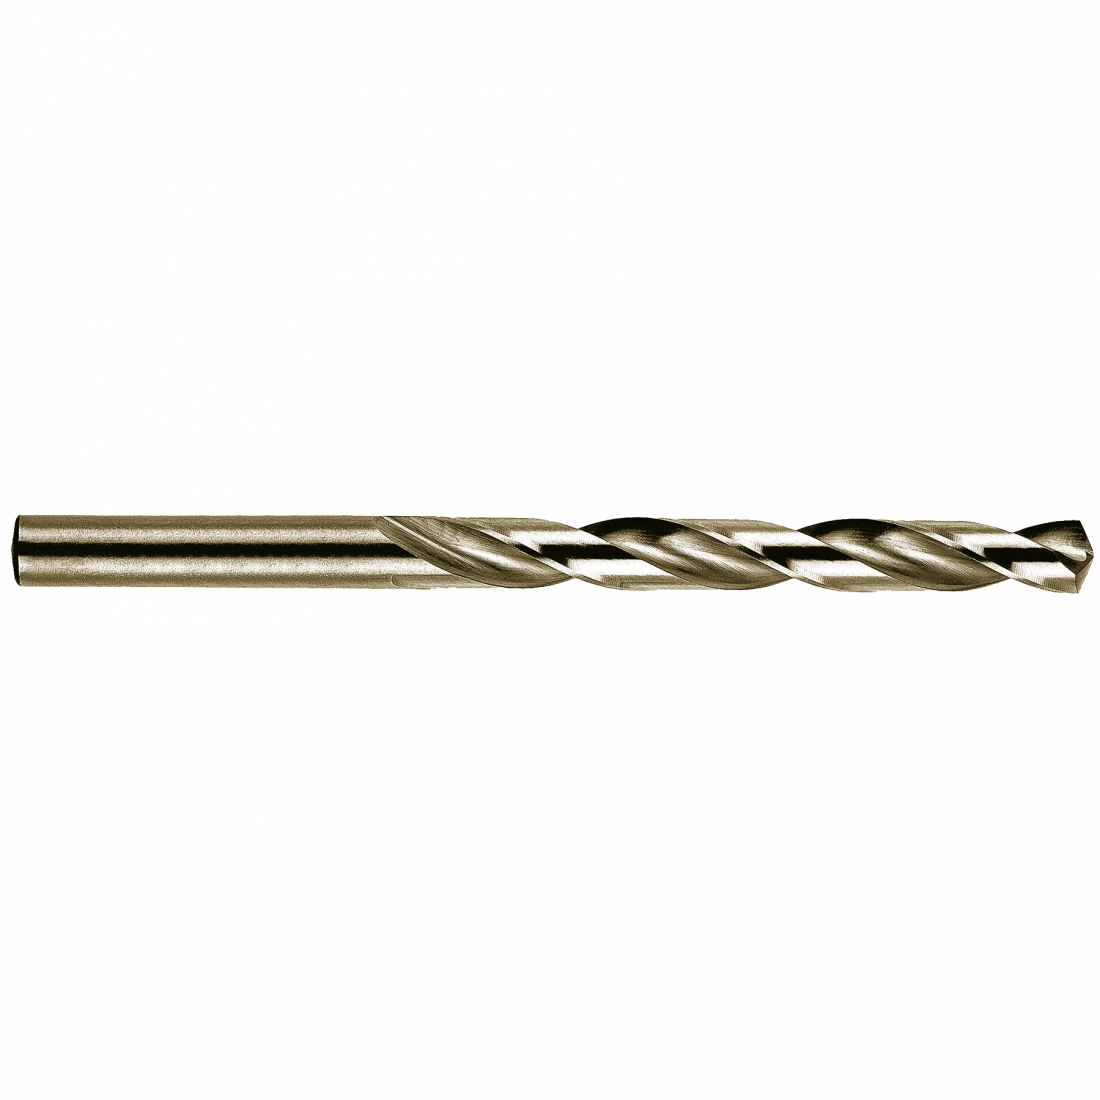 Сверло по металлу Heller НSS-Co DIN 338 RN 14х108х160мм (5шт)